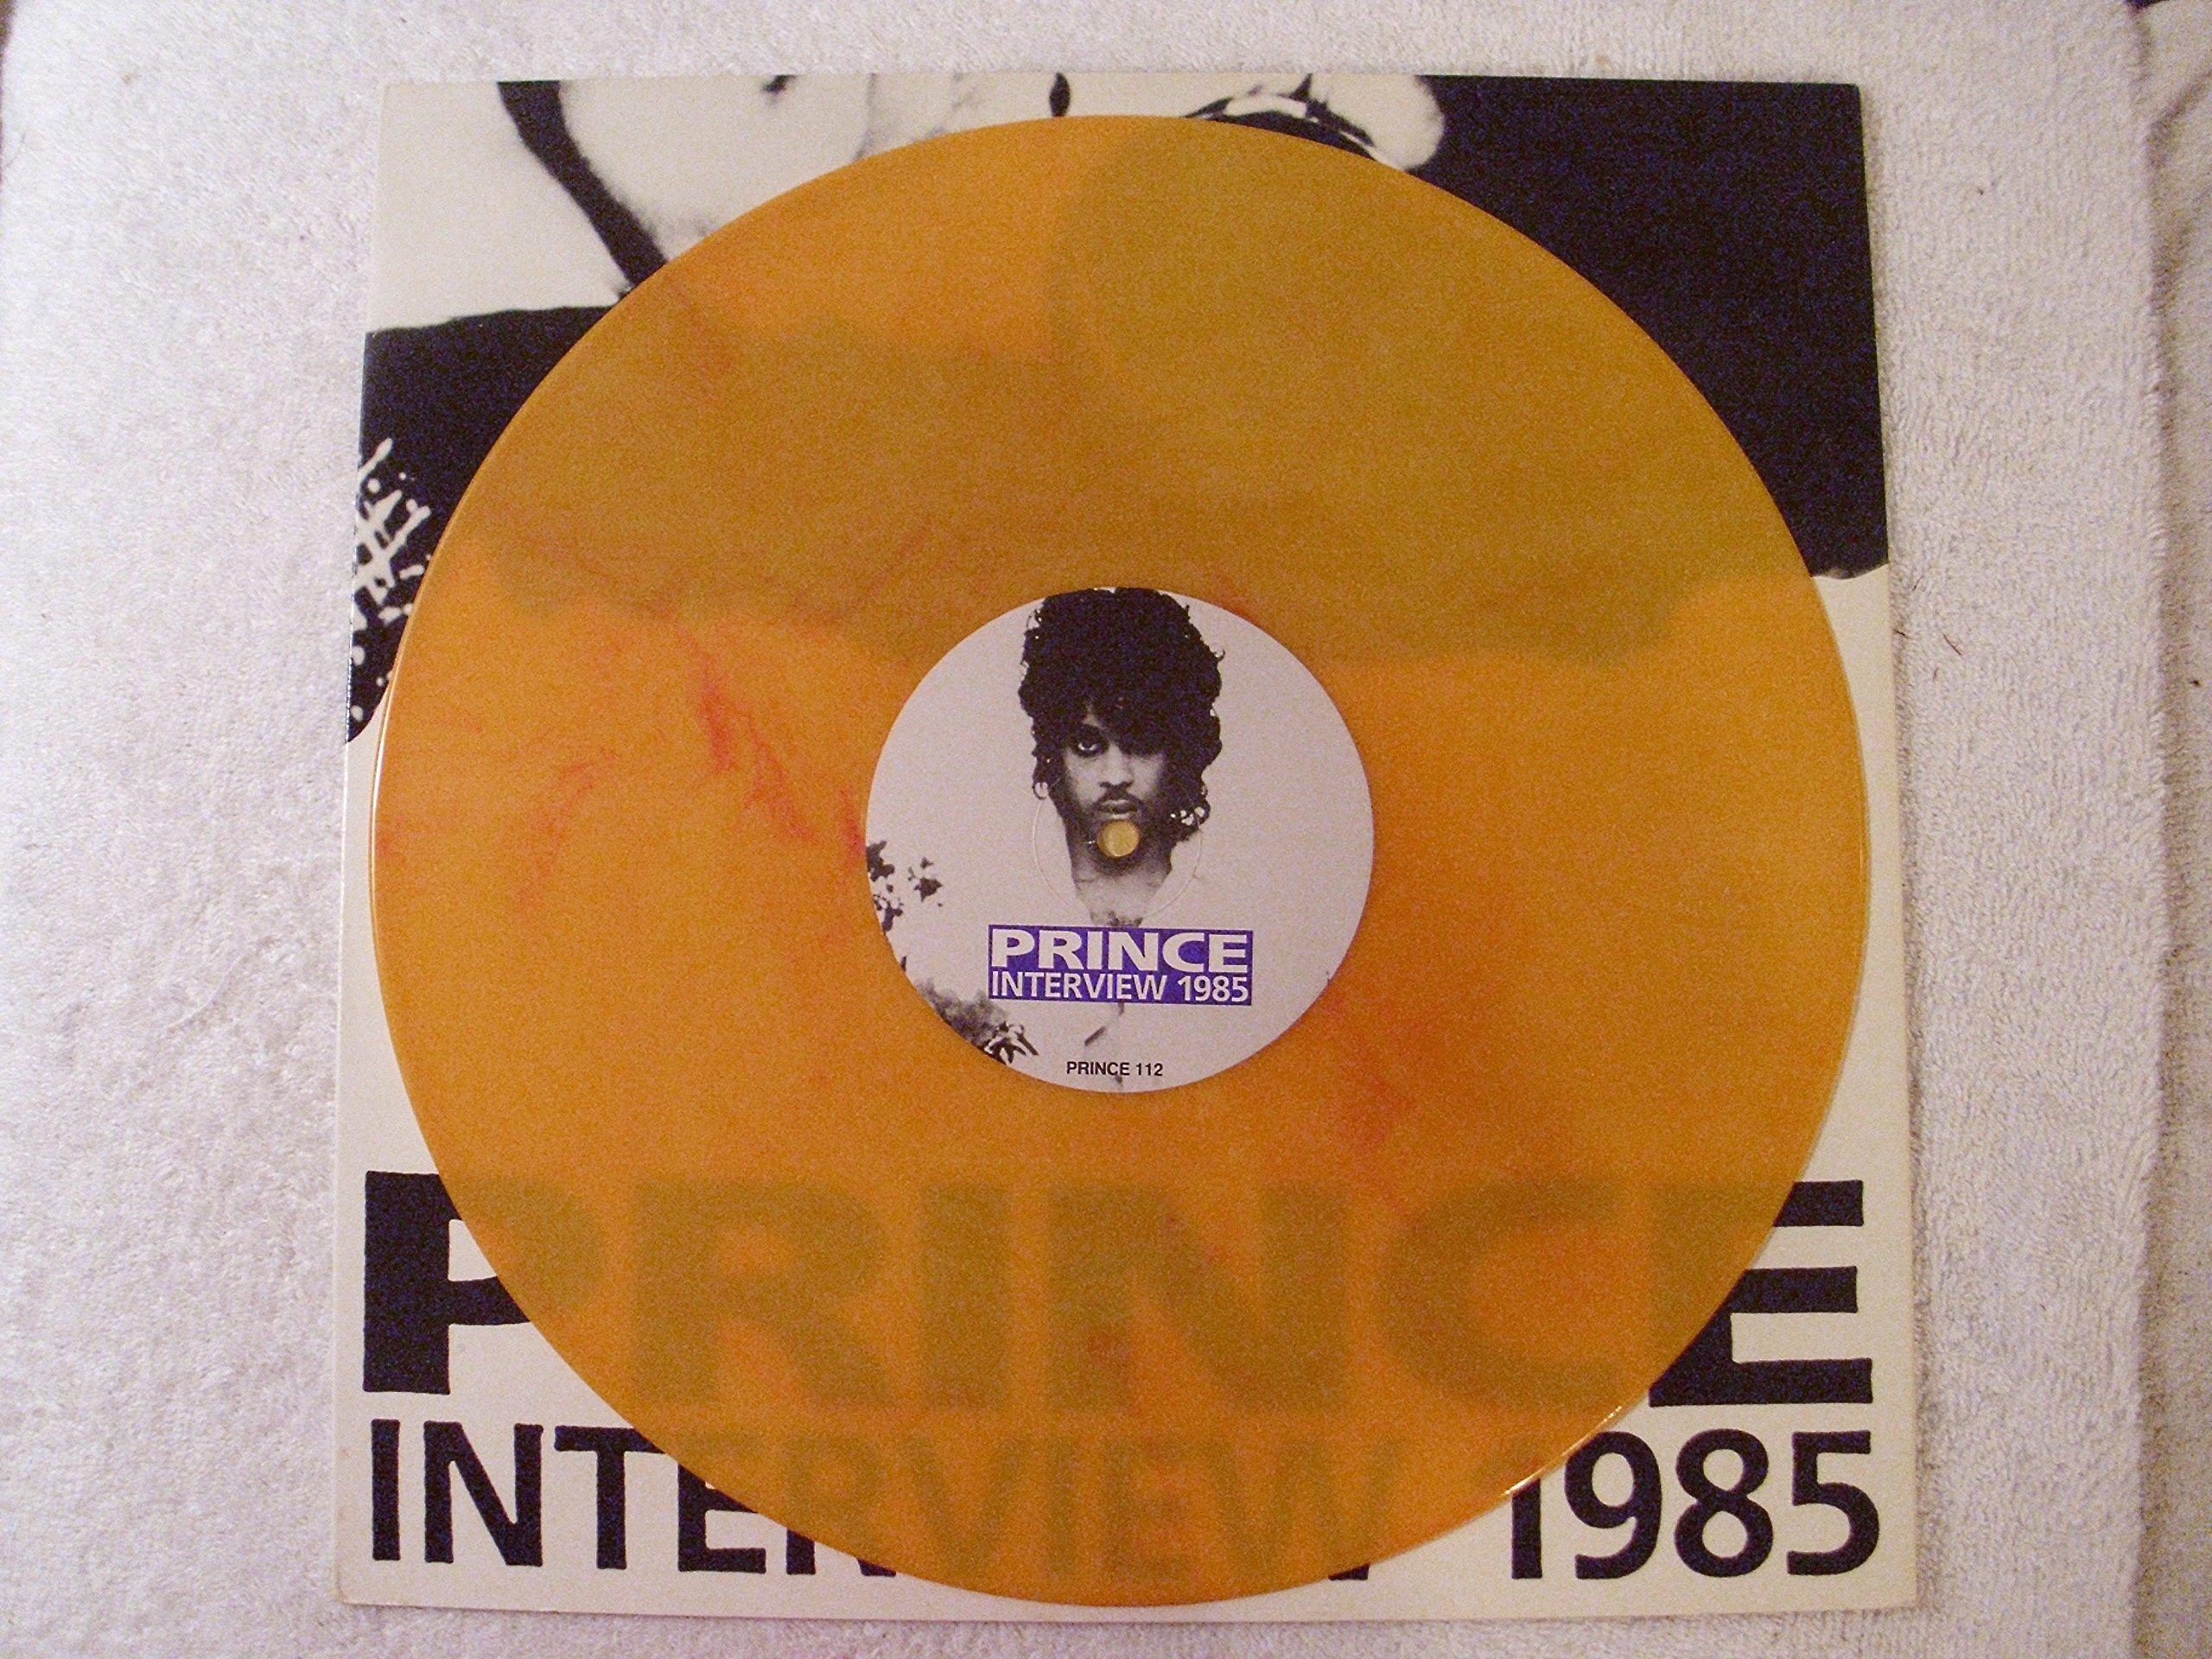 Prince Interview 1985 YELLOW Vinyl UK Import LP